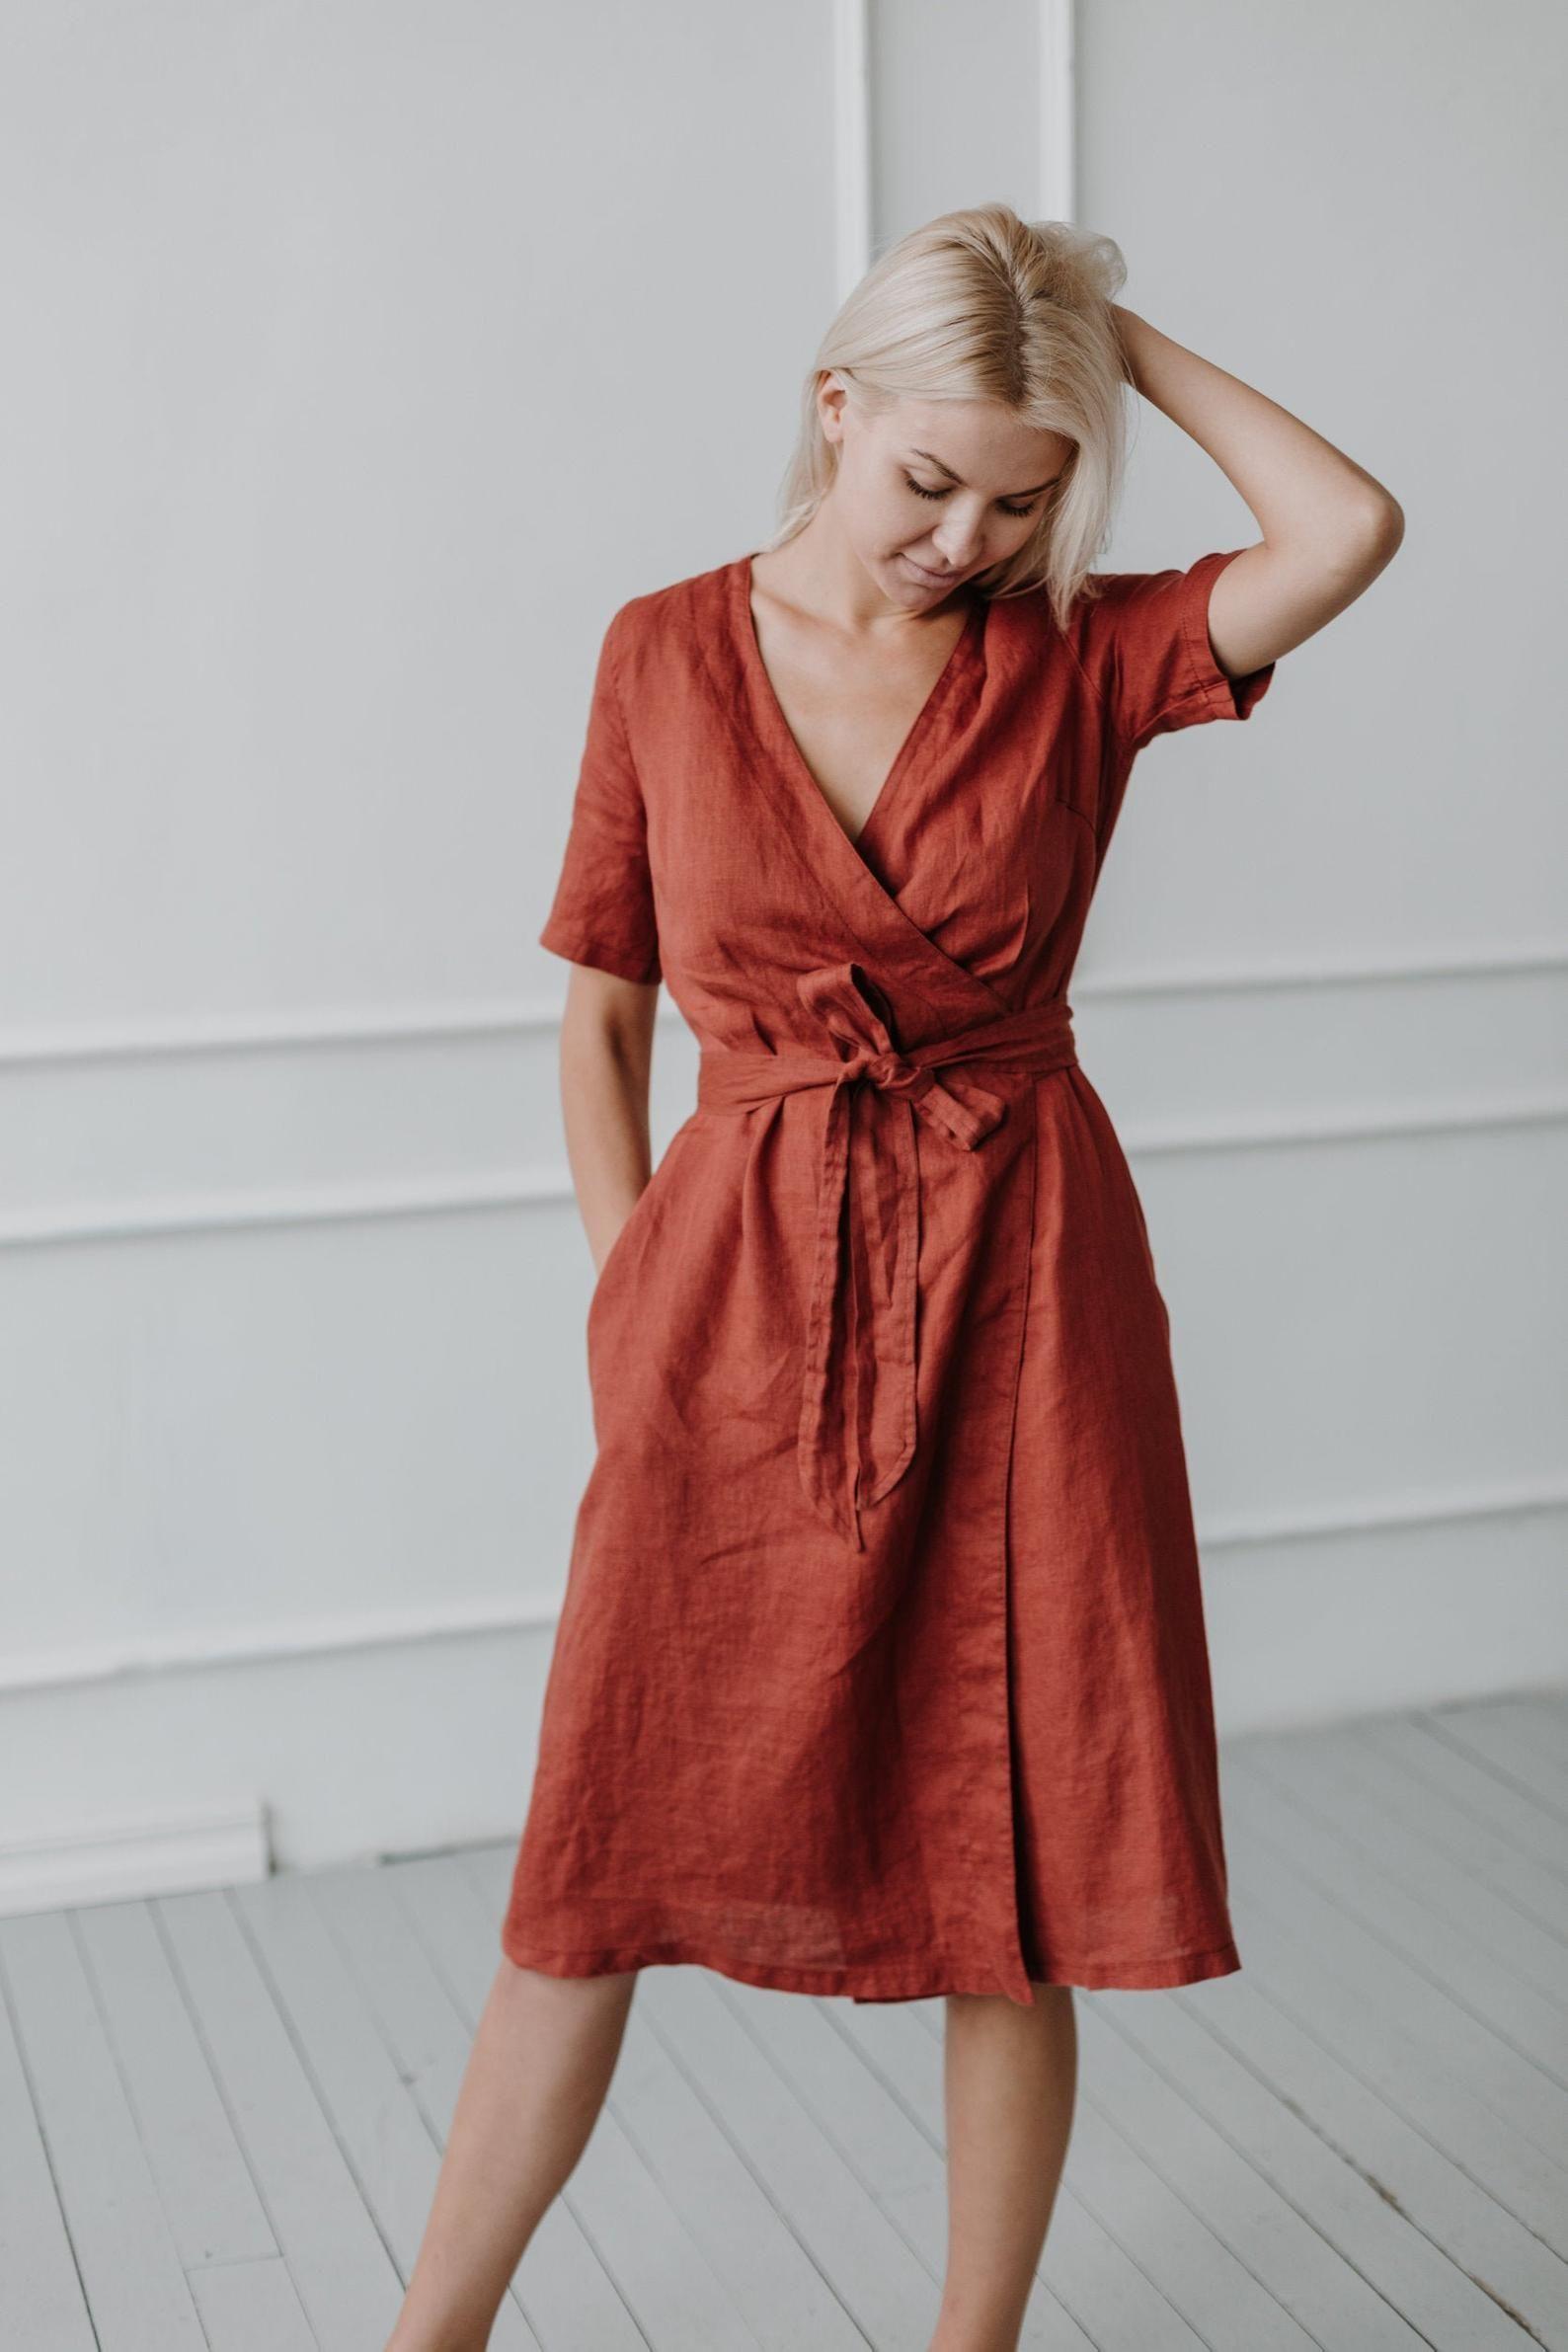 100 % Leinen Terrakotta wickeln Kleid / ... - #flachs # ...